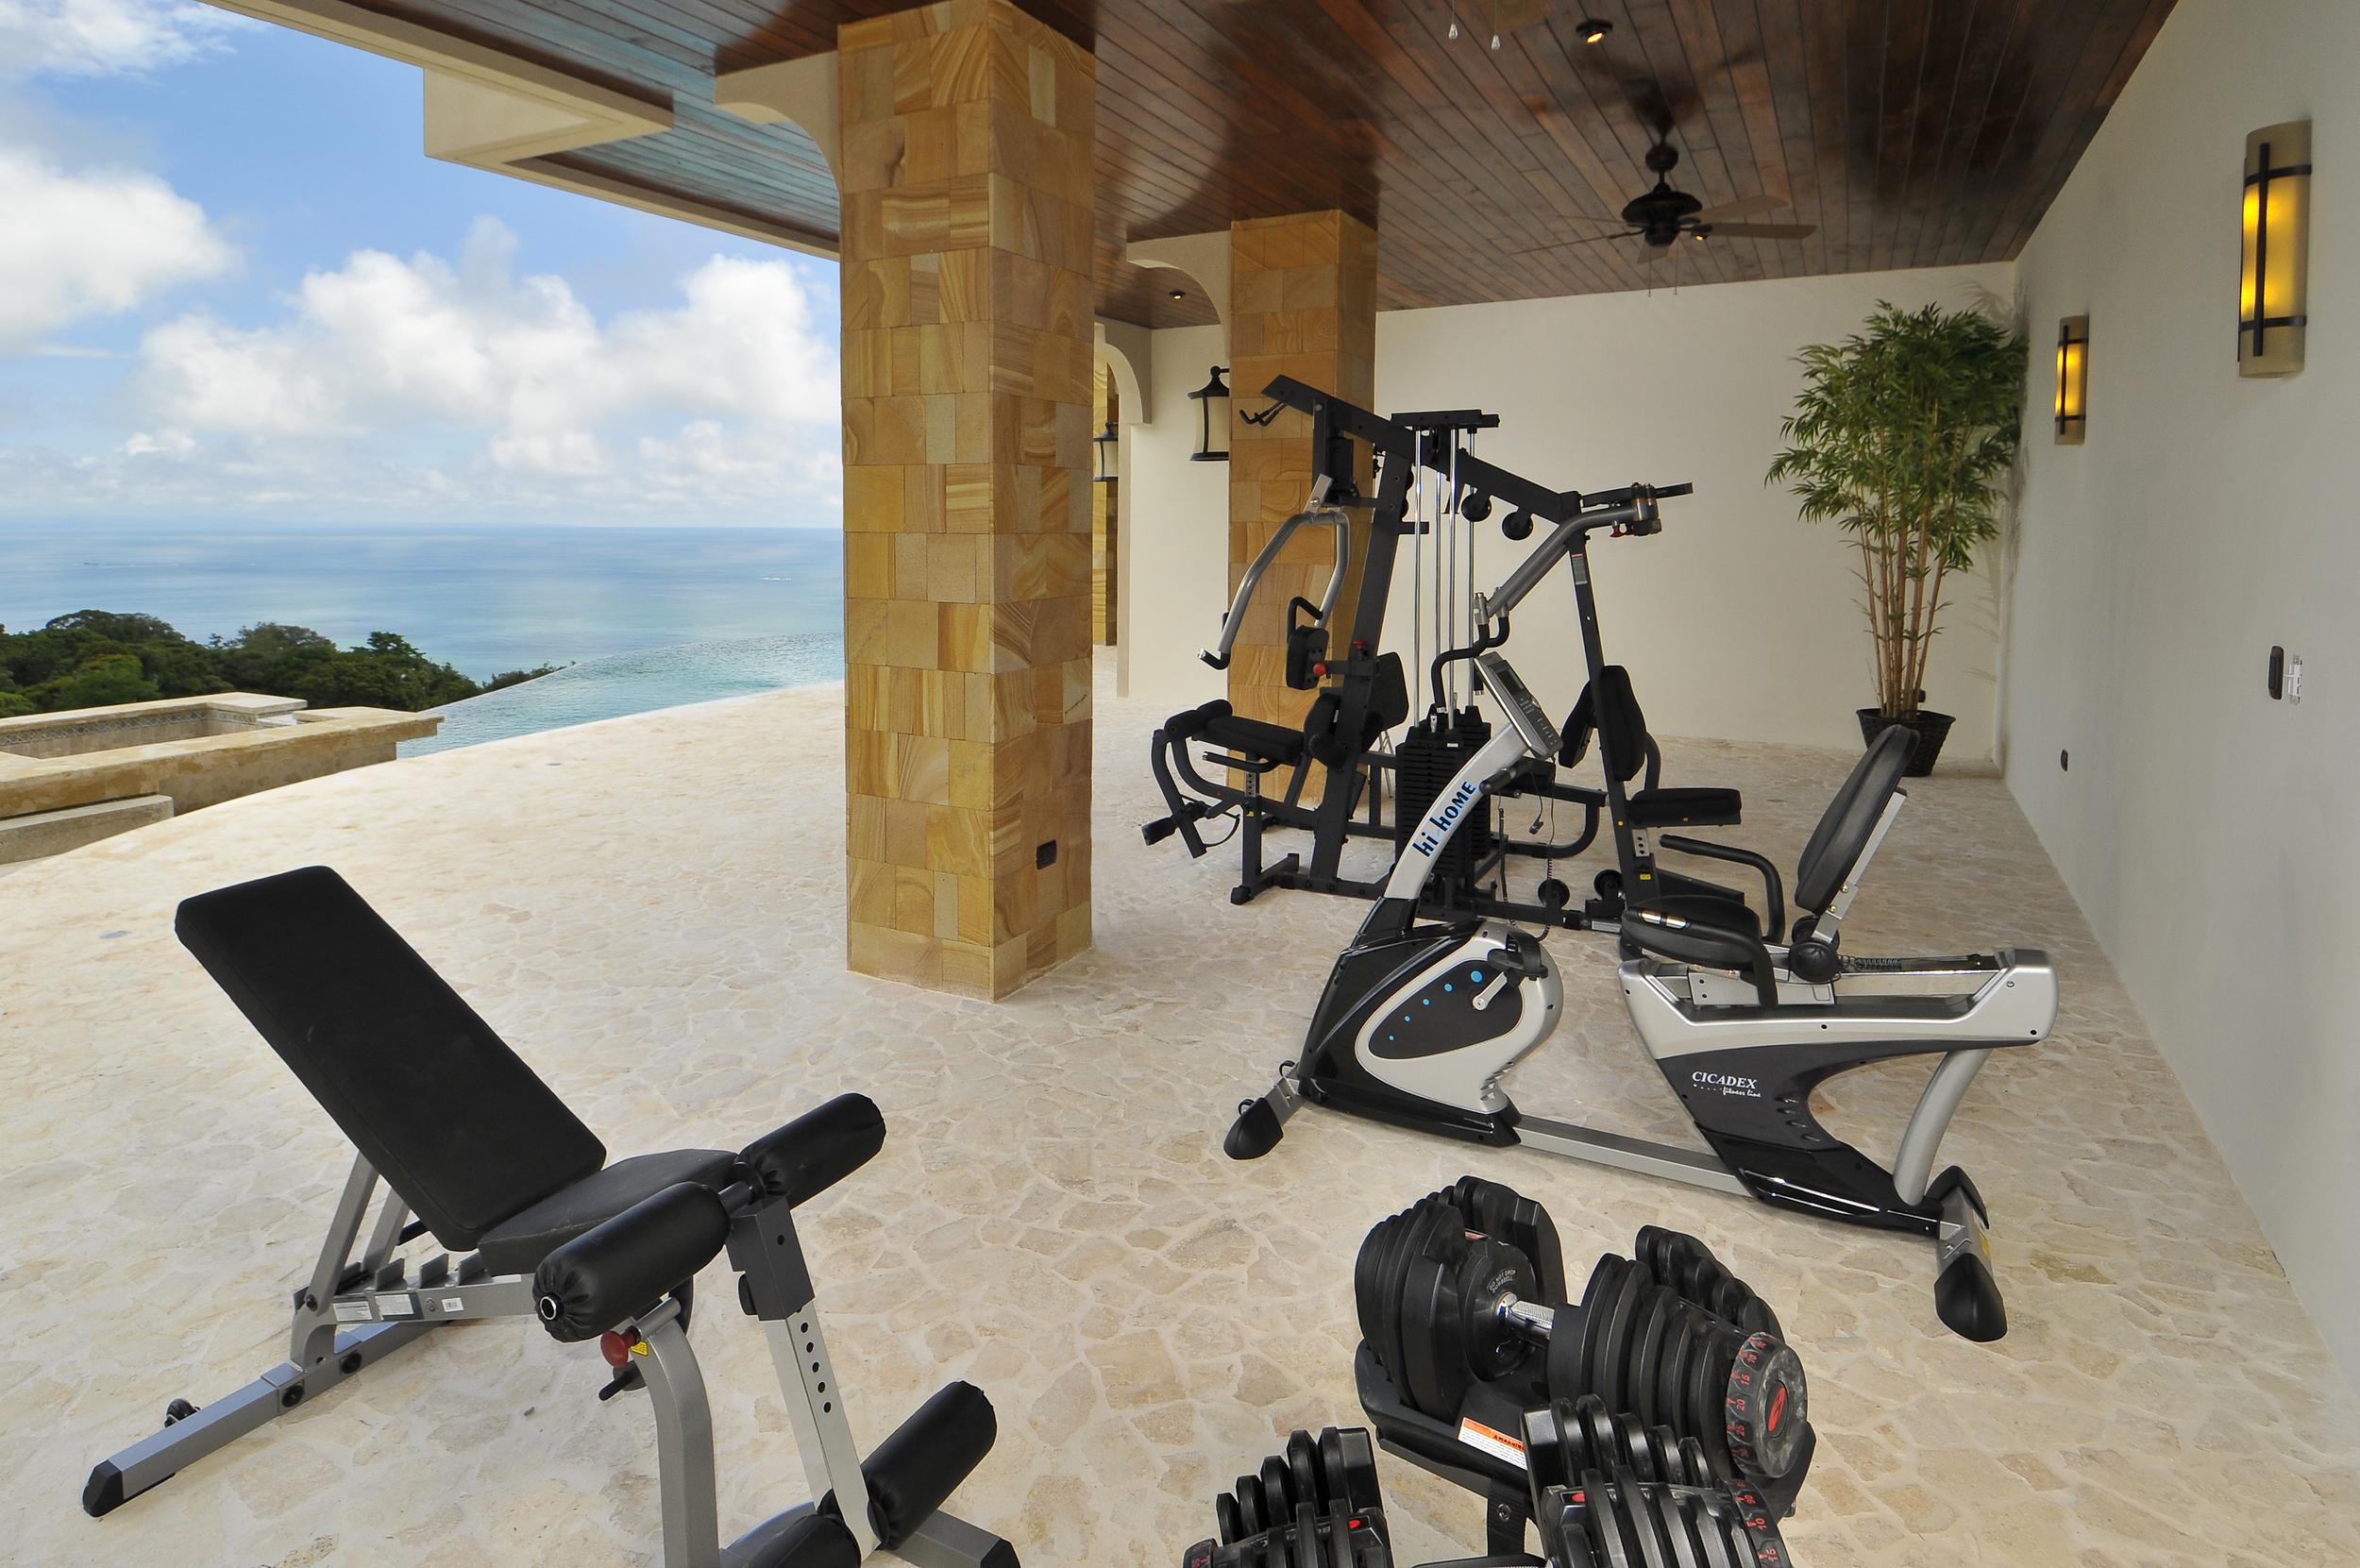 flex5-yoga-retreat-costa-rica-villa-gym-fitness-room-ocean-view.jpg